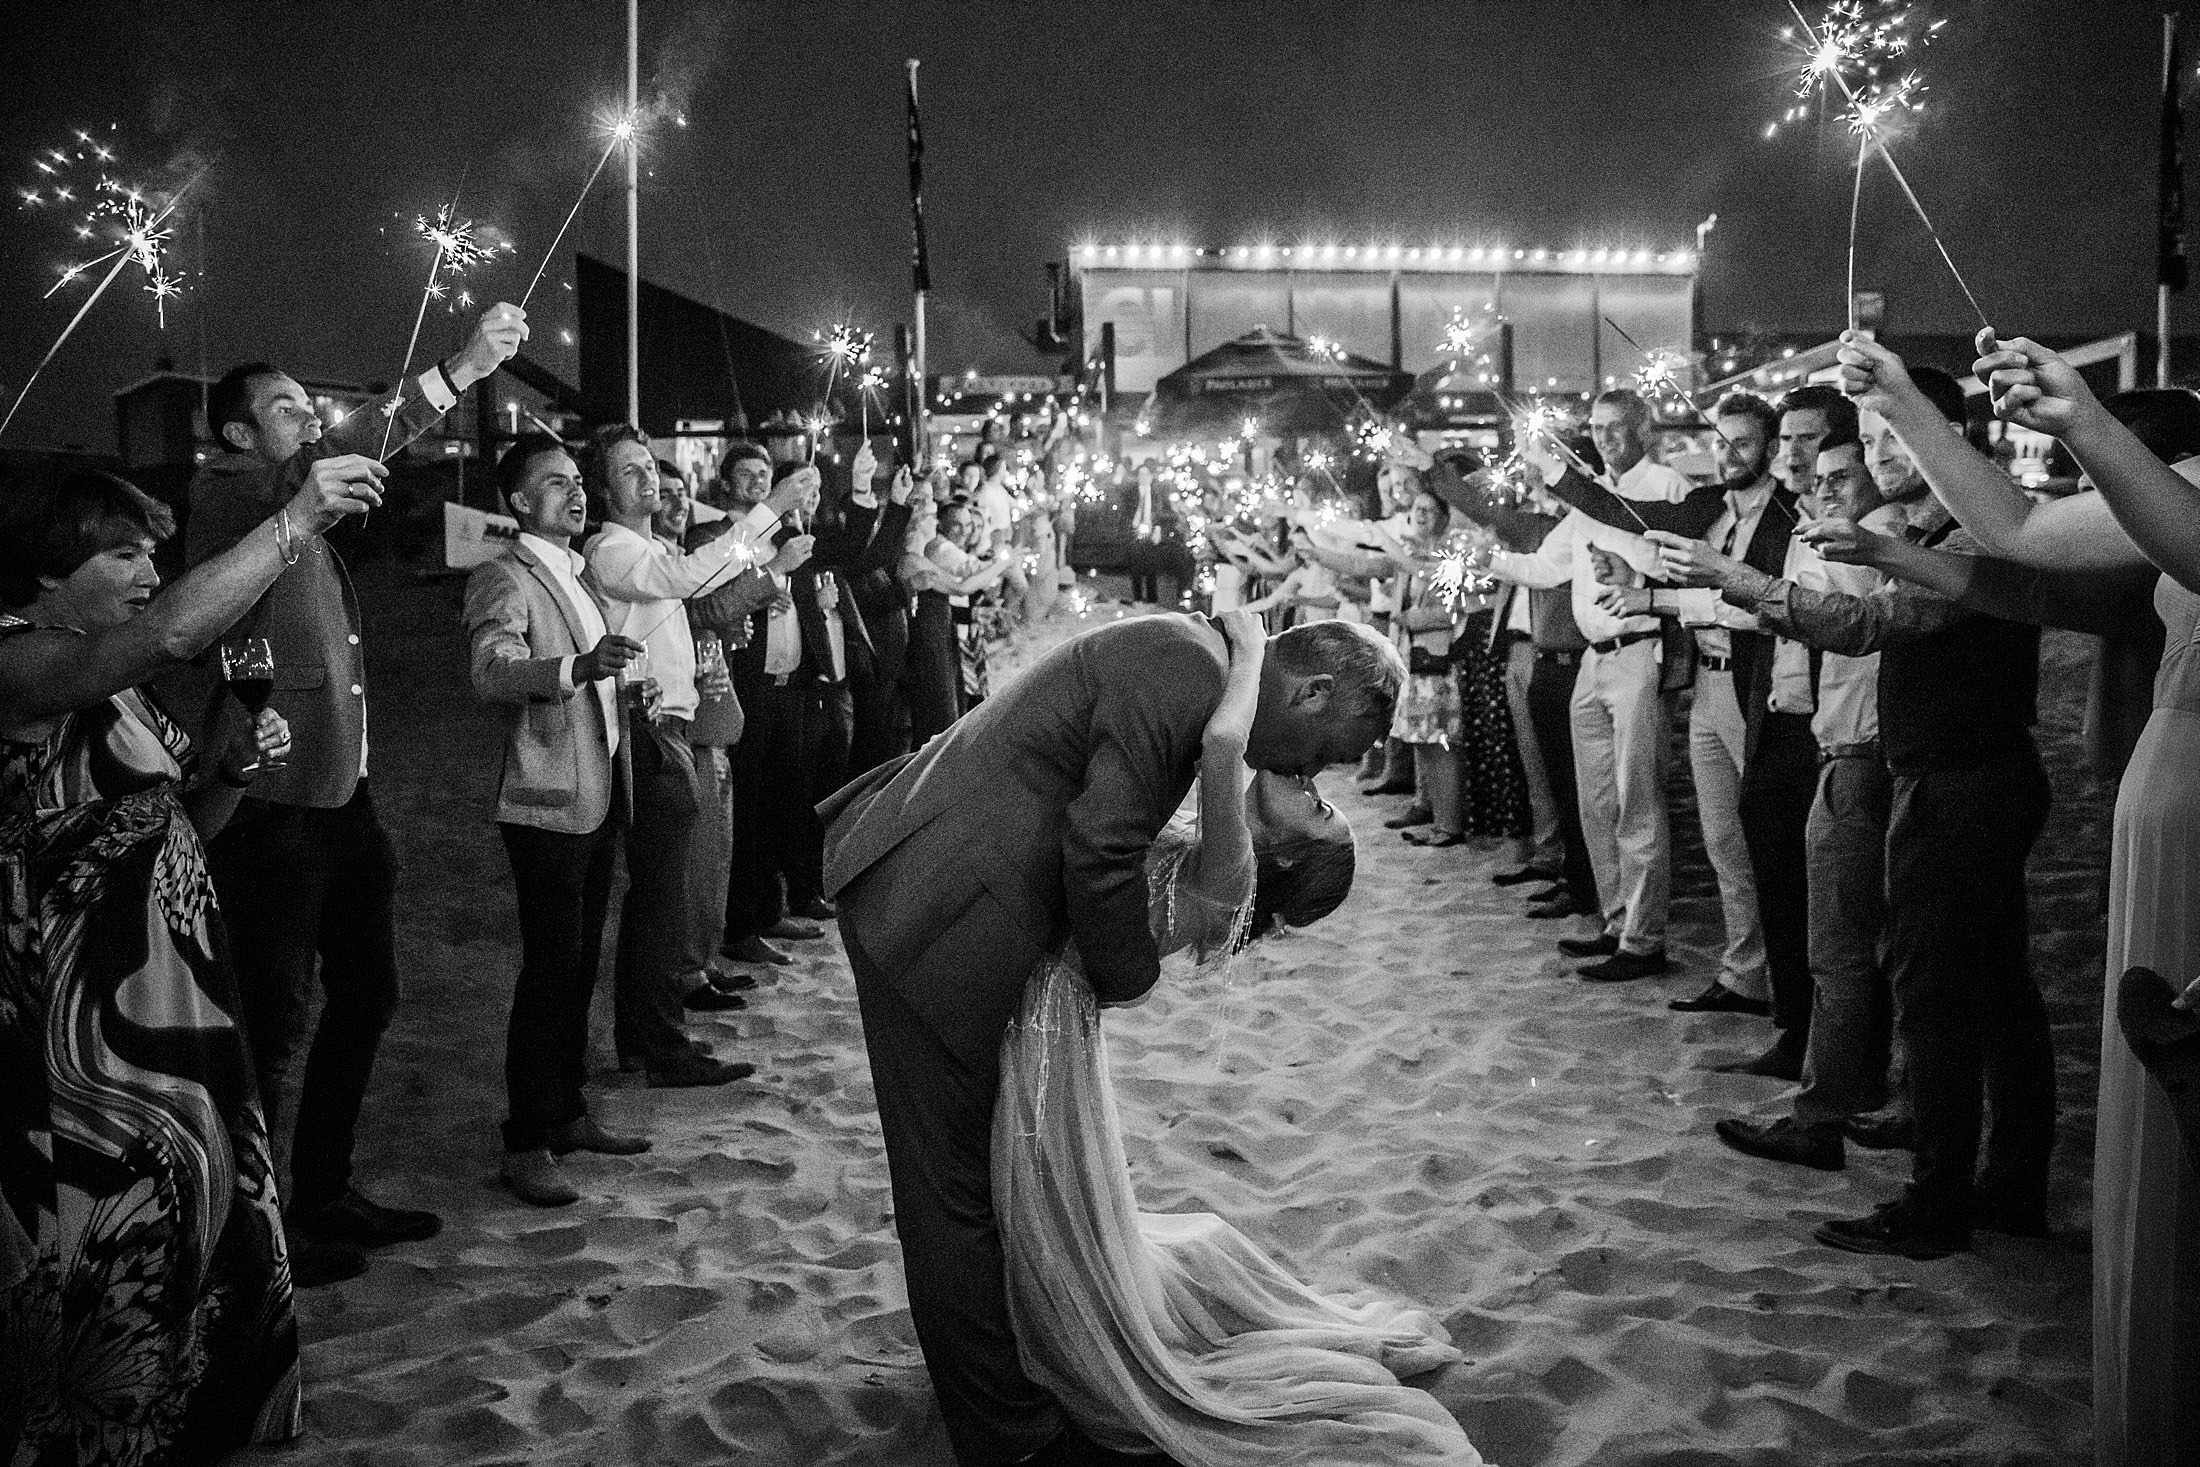 74-exit-bruidspaar-feest-bruiloft